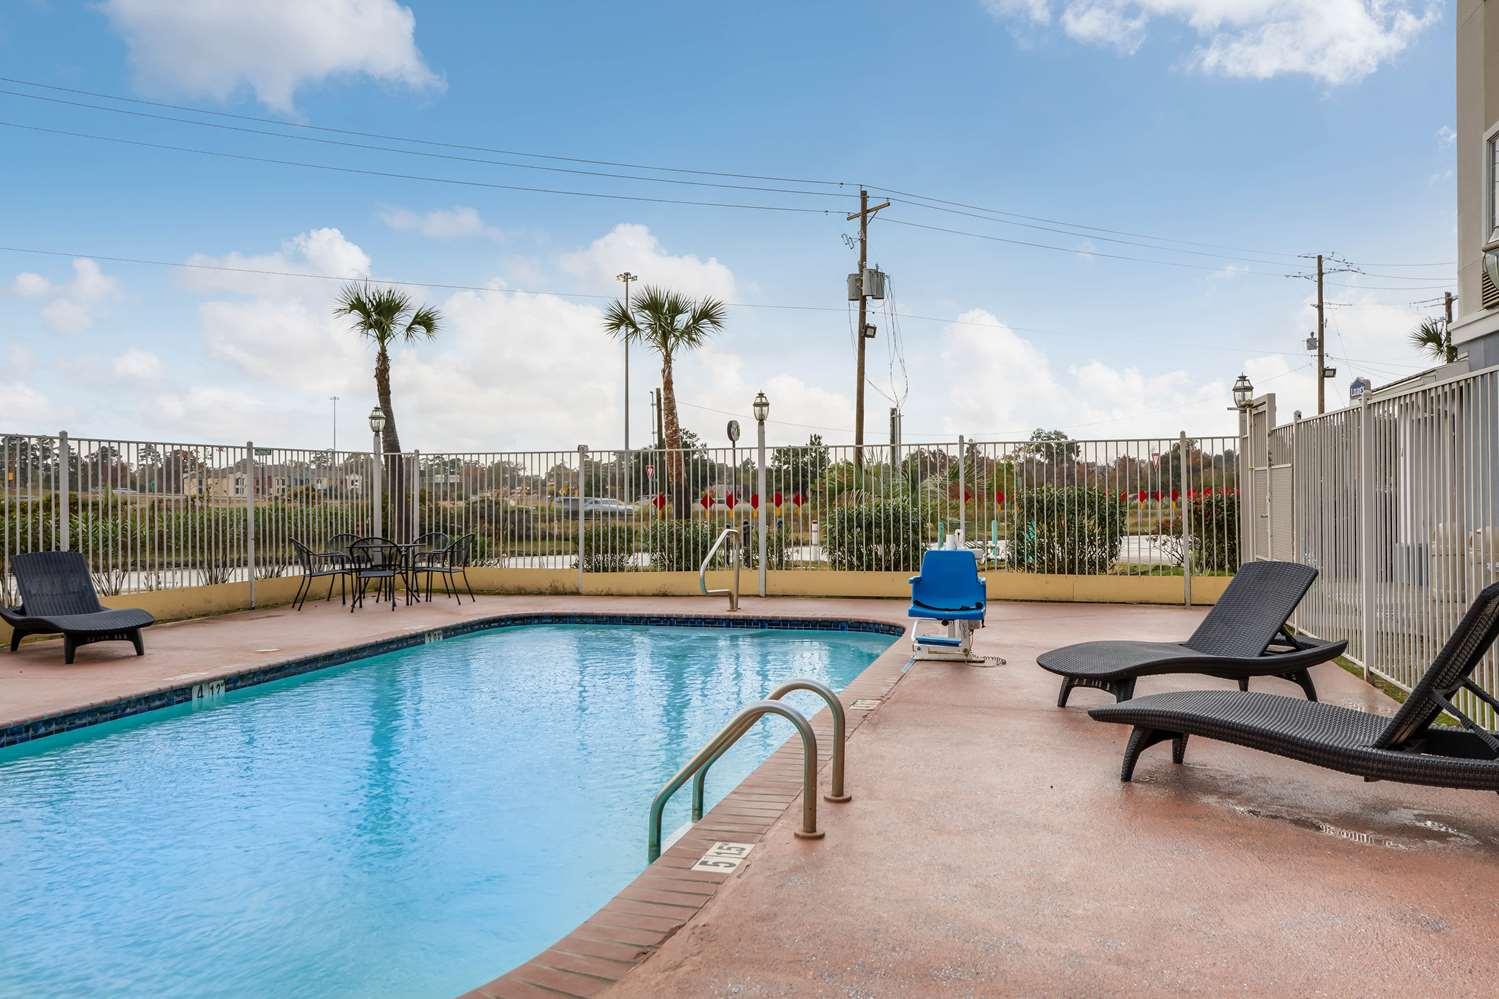 Pool - Studio 6 Extended Stay Hotel Sulphur